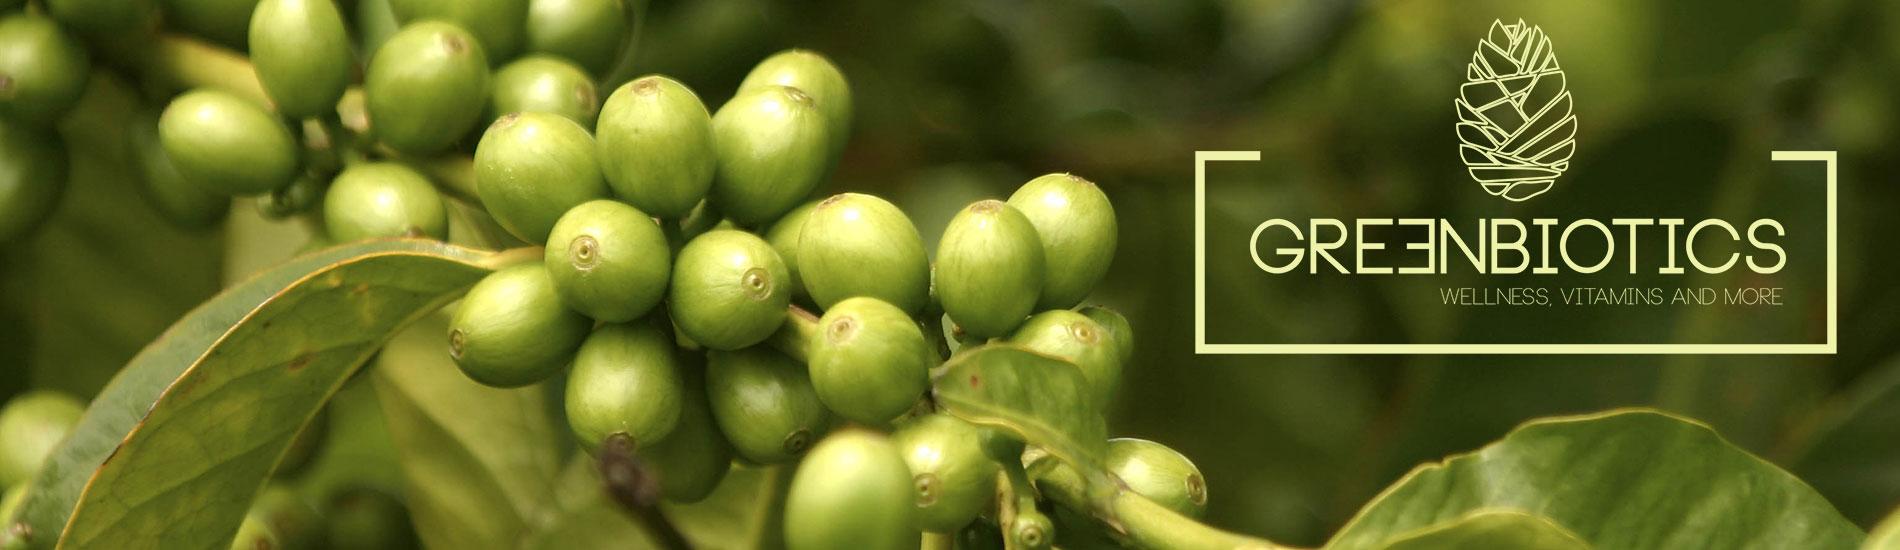 green-biotics-main-1-1